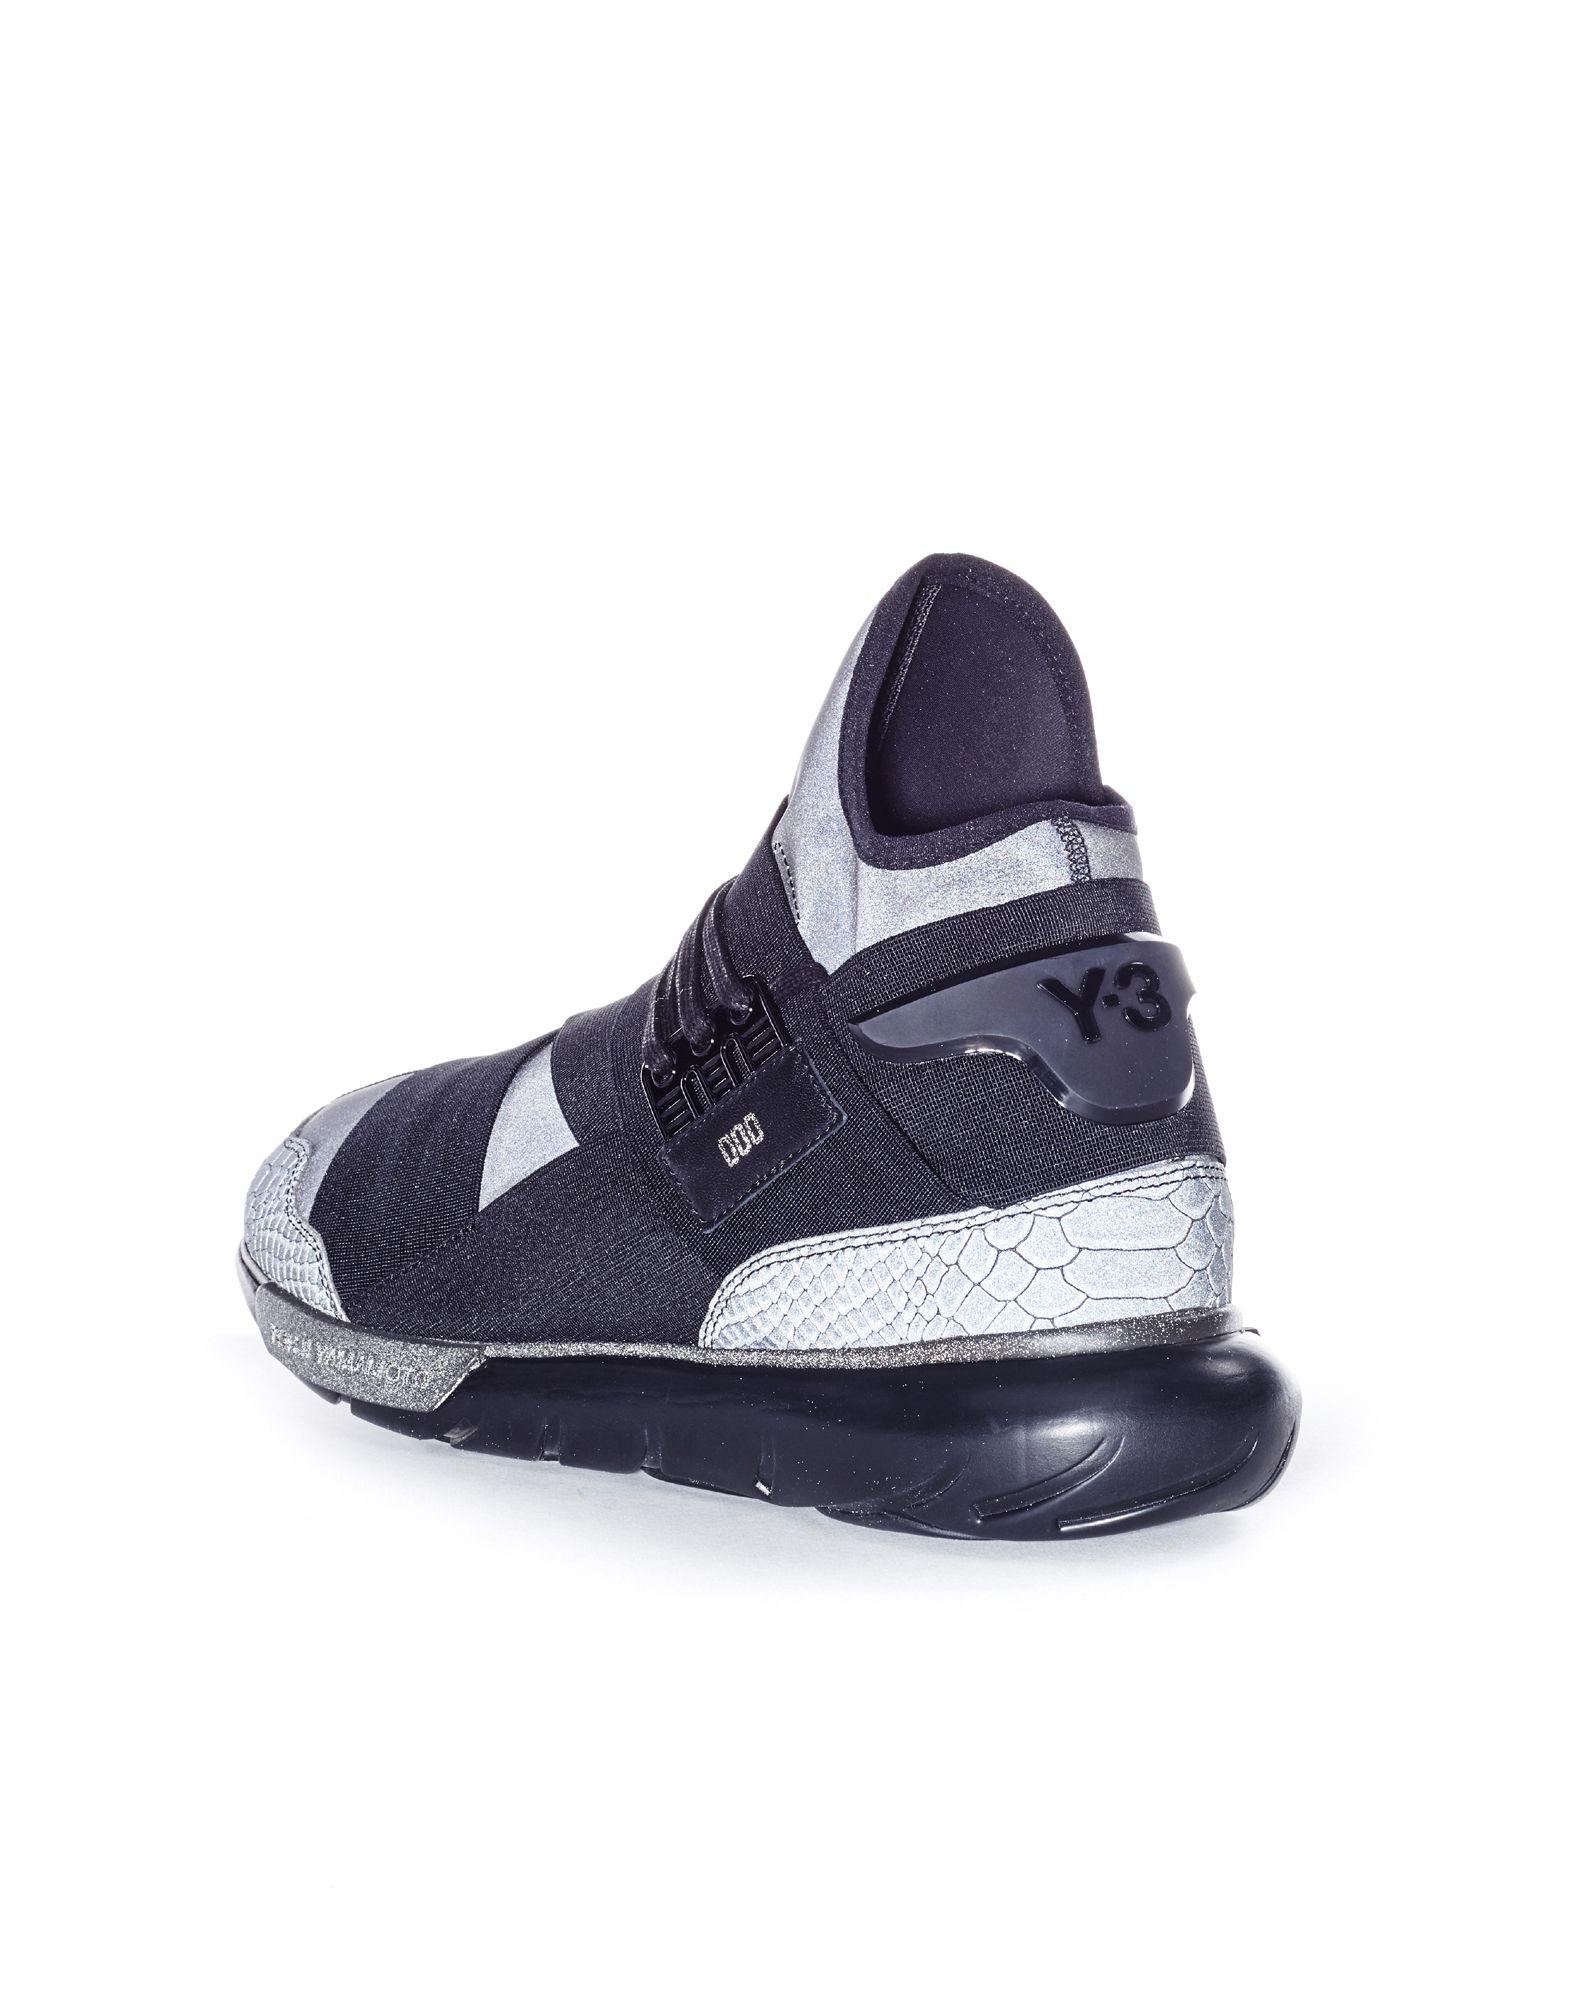 8e8e7830c9975 ... Y-3 Y-3 Qasa 300 Sneakers Man e ...